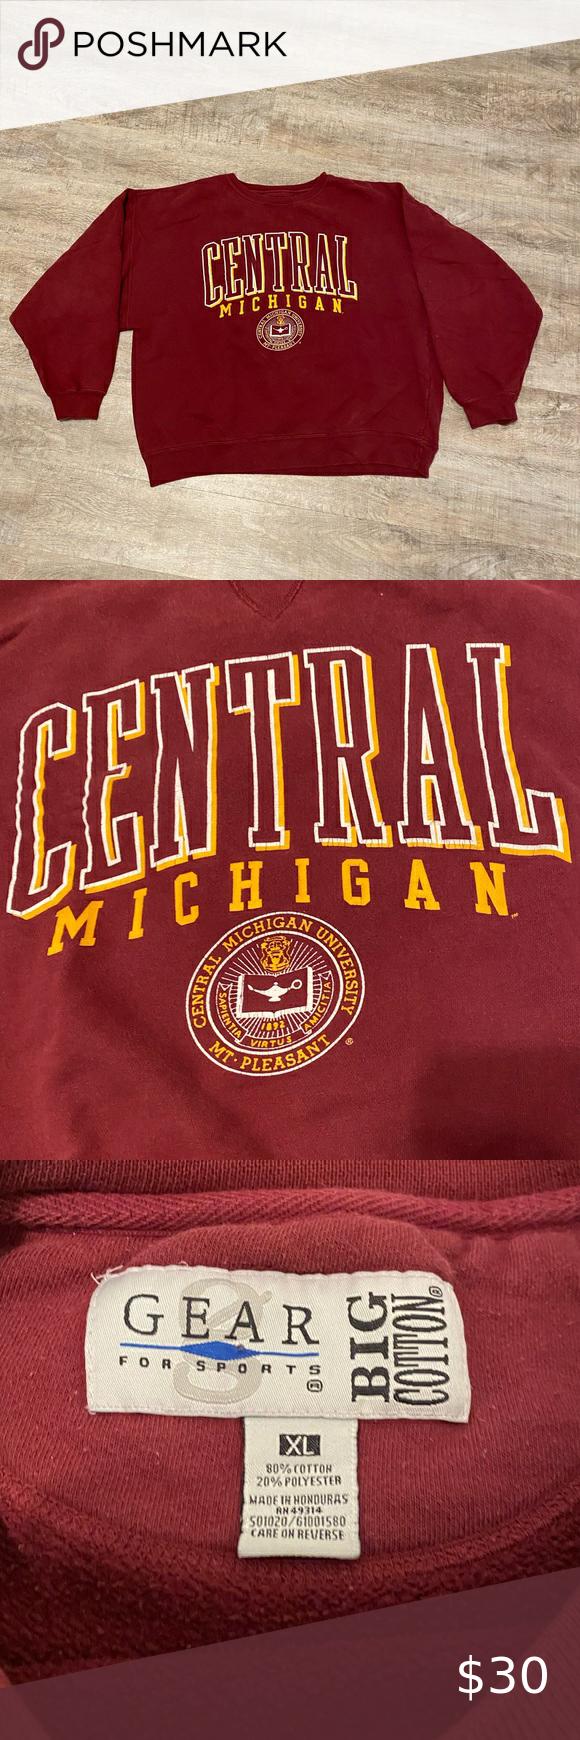 Gear For Sports Central Michigan Sweatshirt Central Michigan University Vintage 90 S Crewneck Sweatshirt Lig Michigan Sweatshirt Sweatshirts Sweatshirt Shirt [ 1740 x 580 Pixel ]